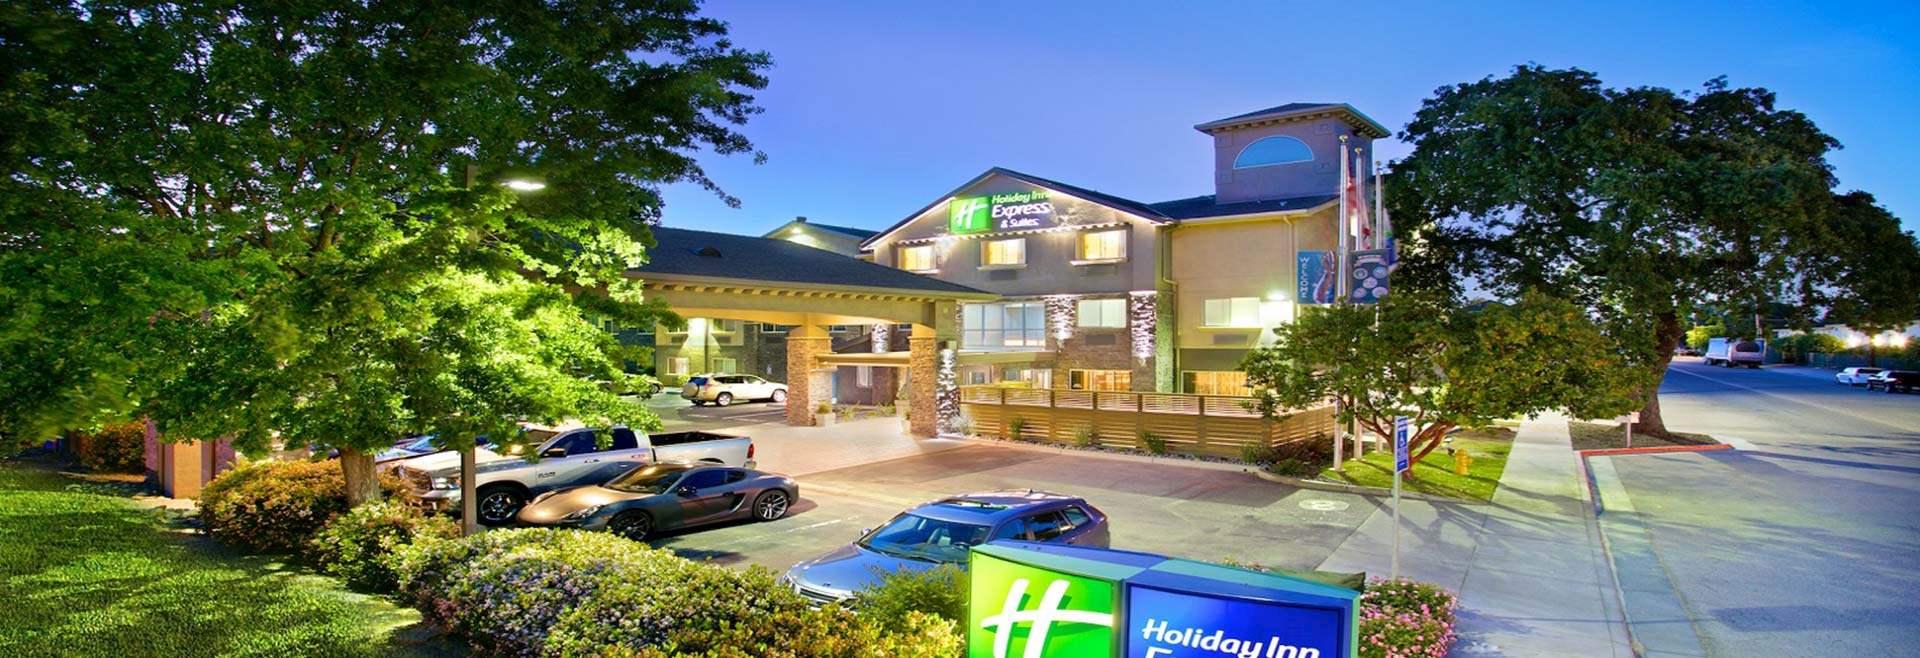 Location of California Hotel